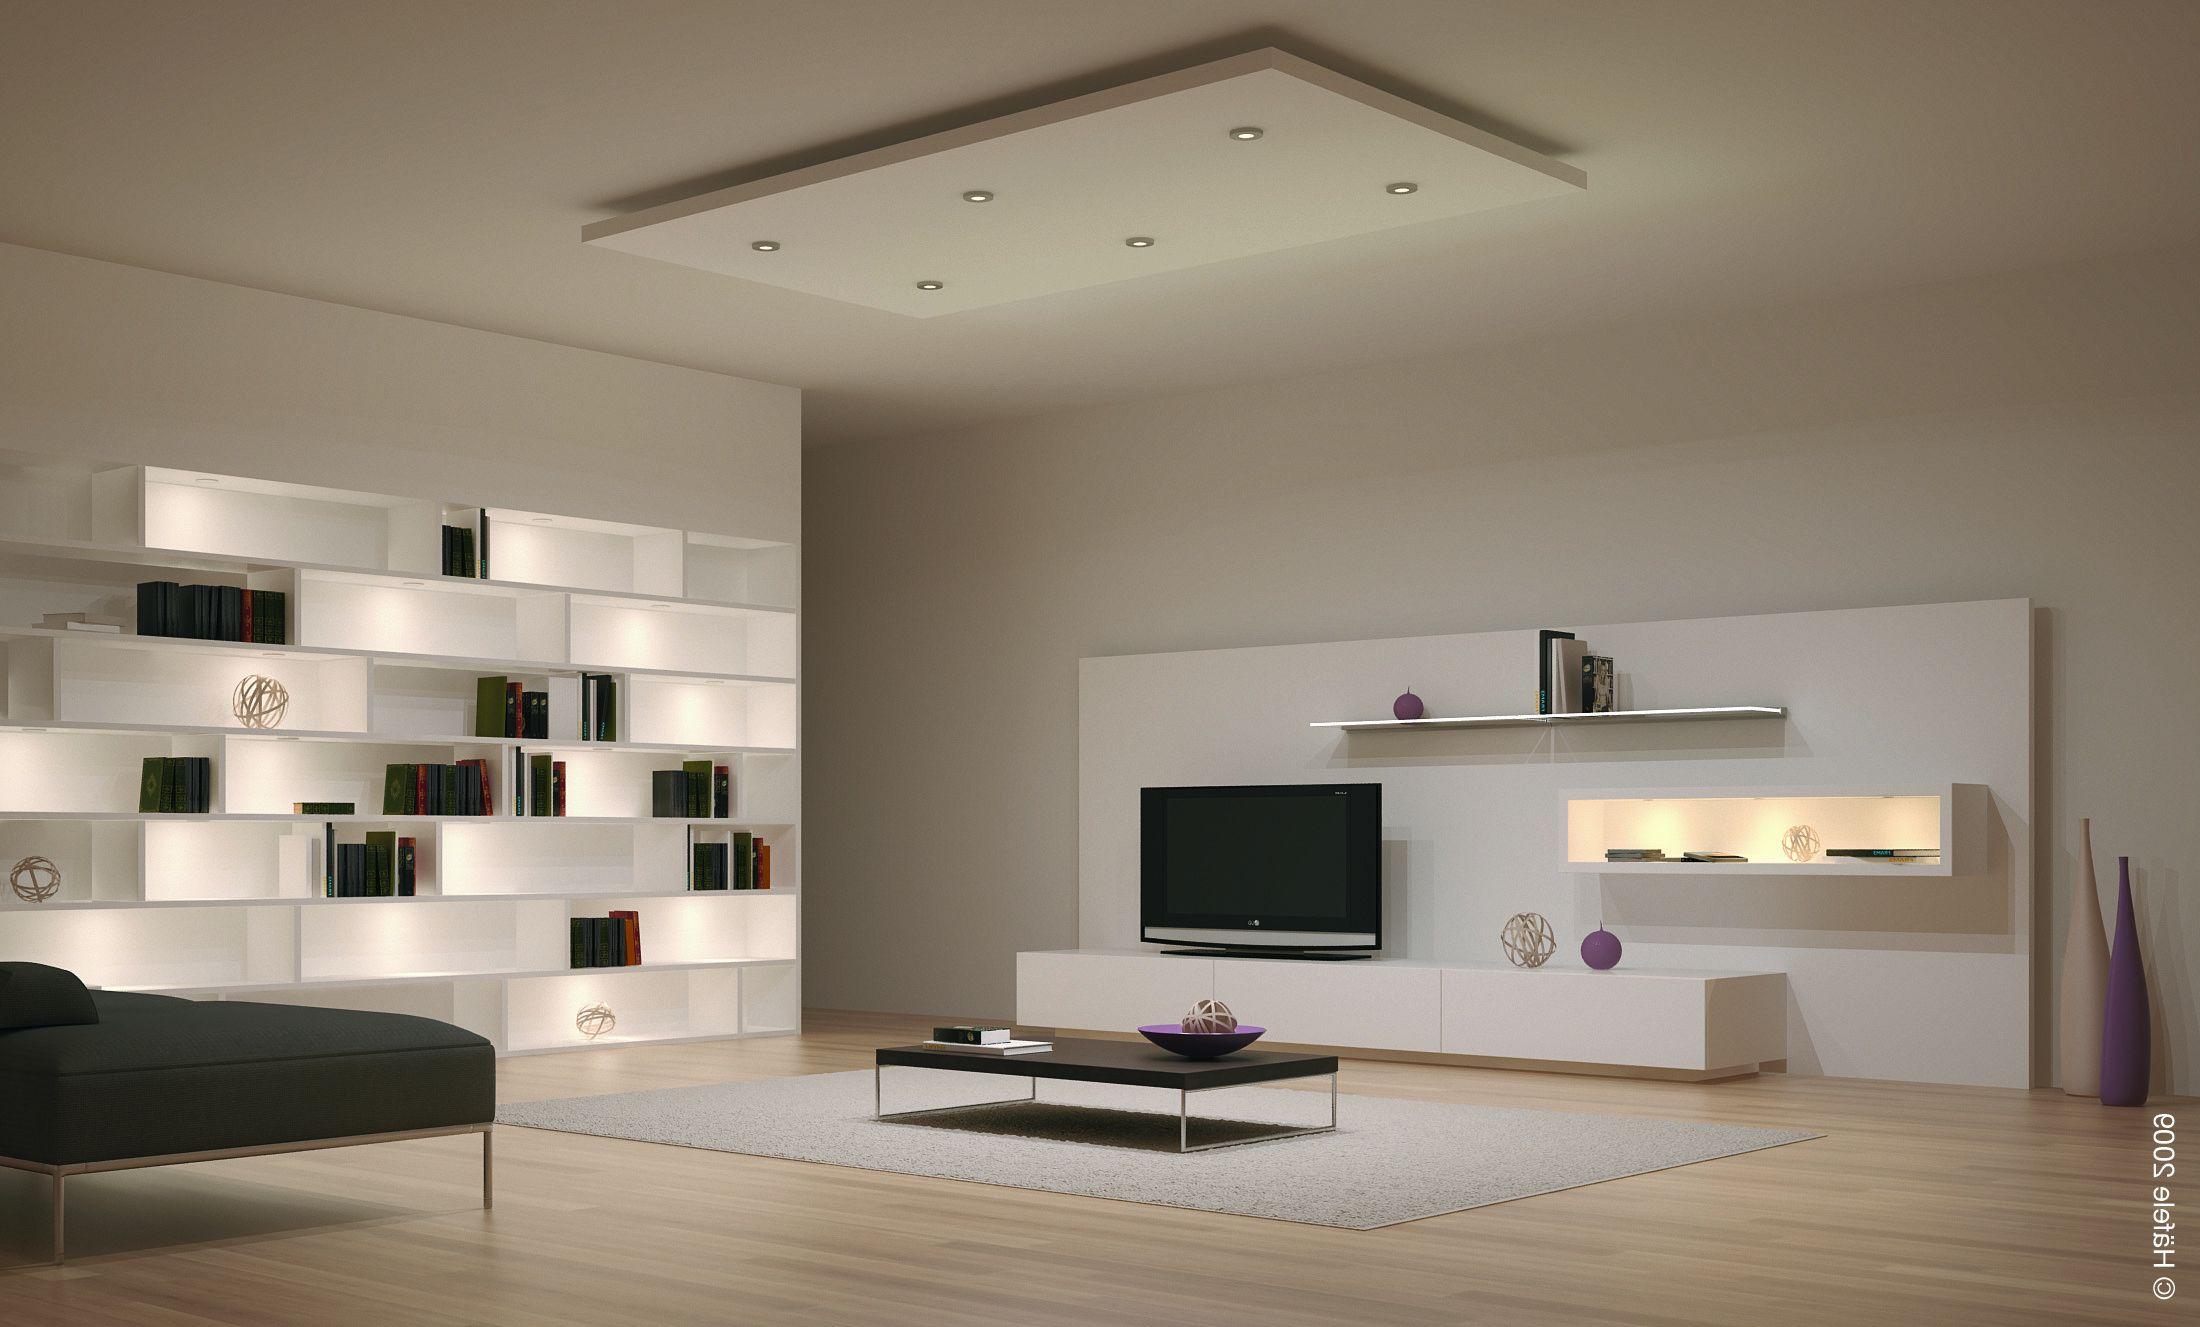 Dekorasi ruang tamu rumah minimalis moden mewah dengan lampu hiasan menarik